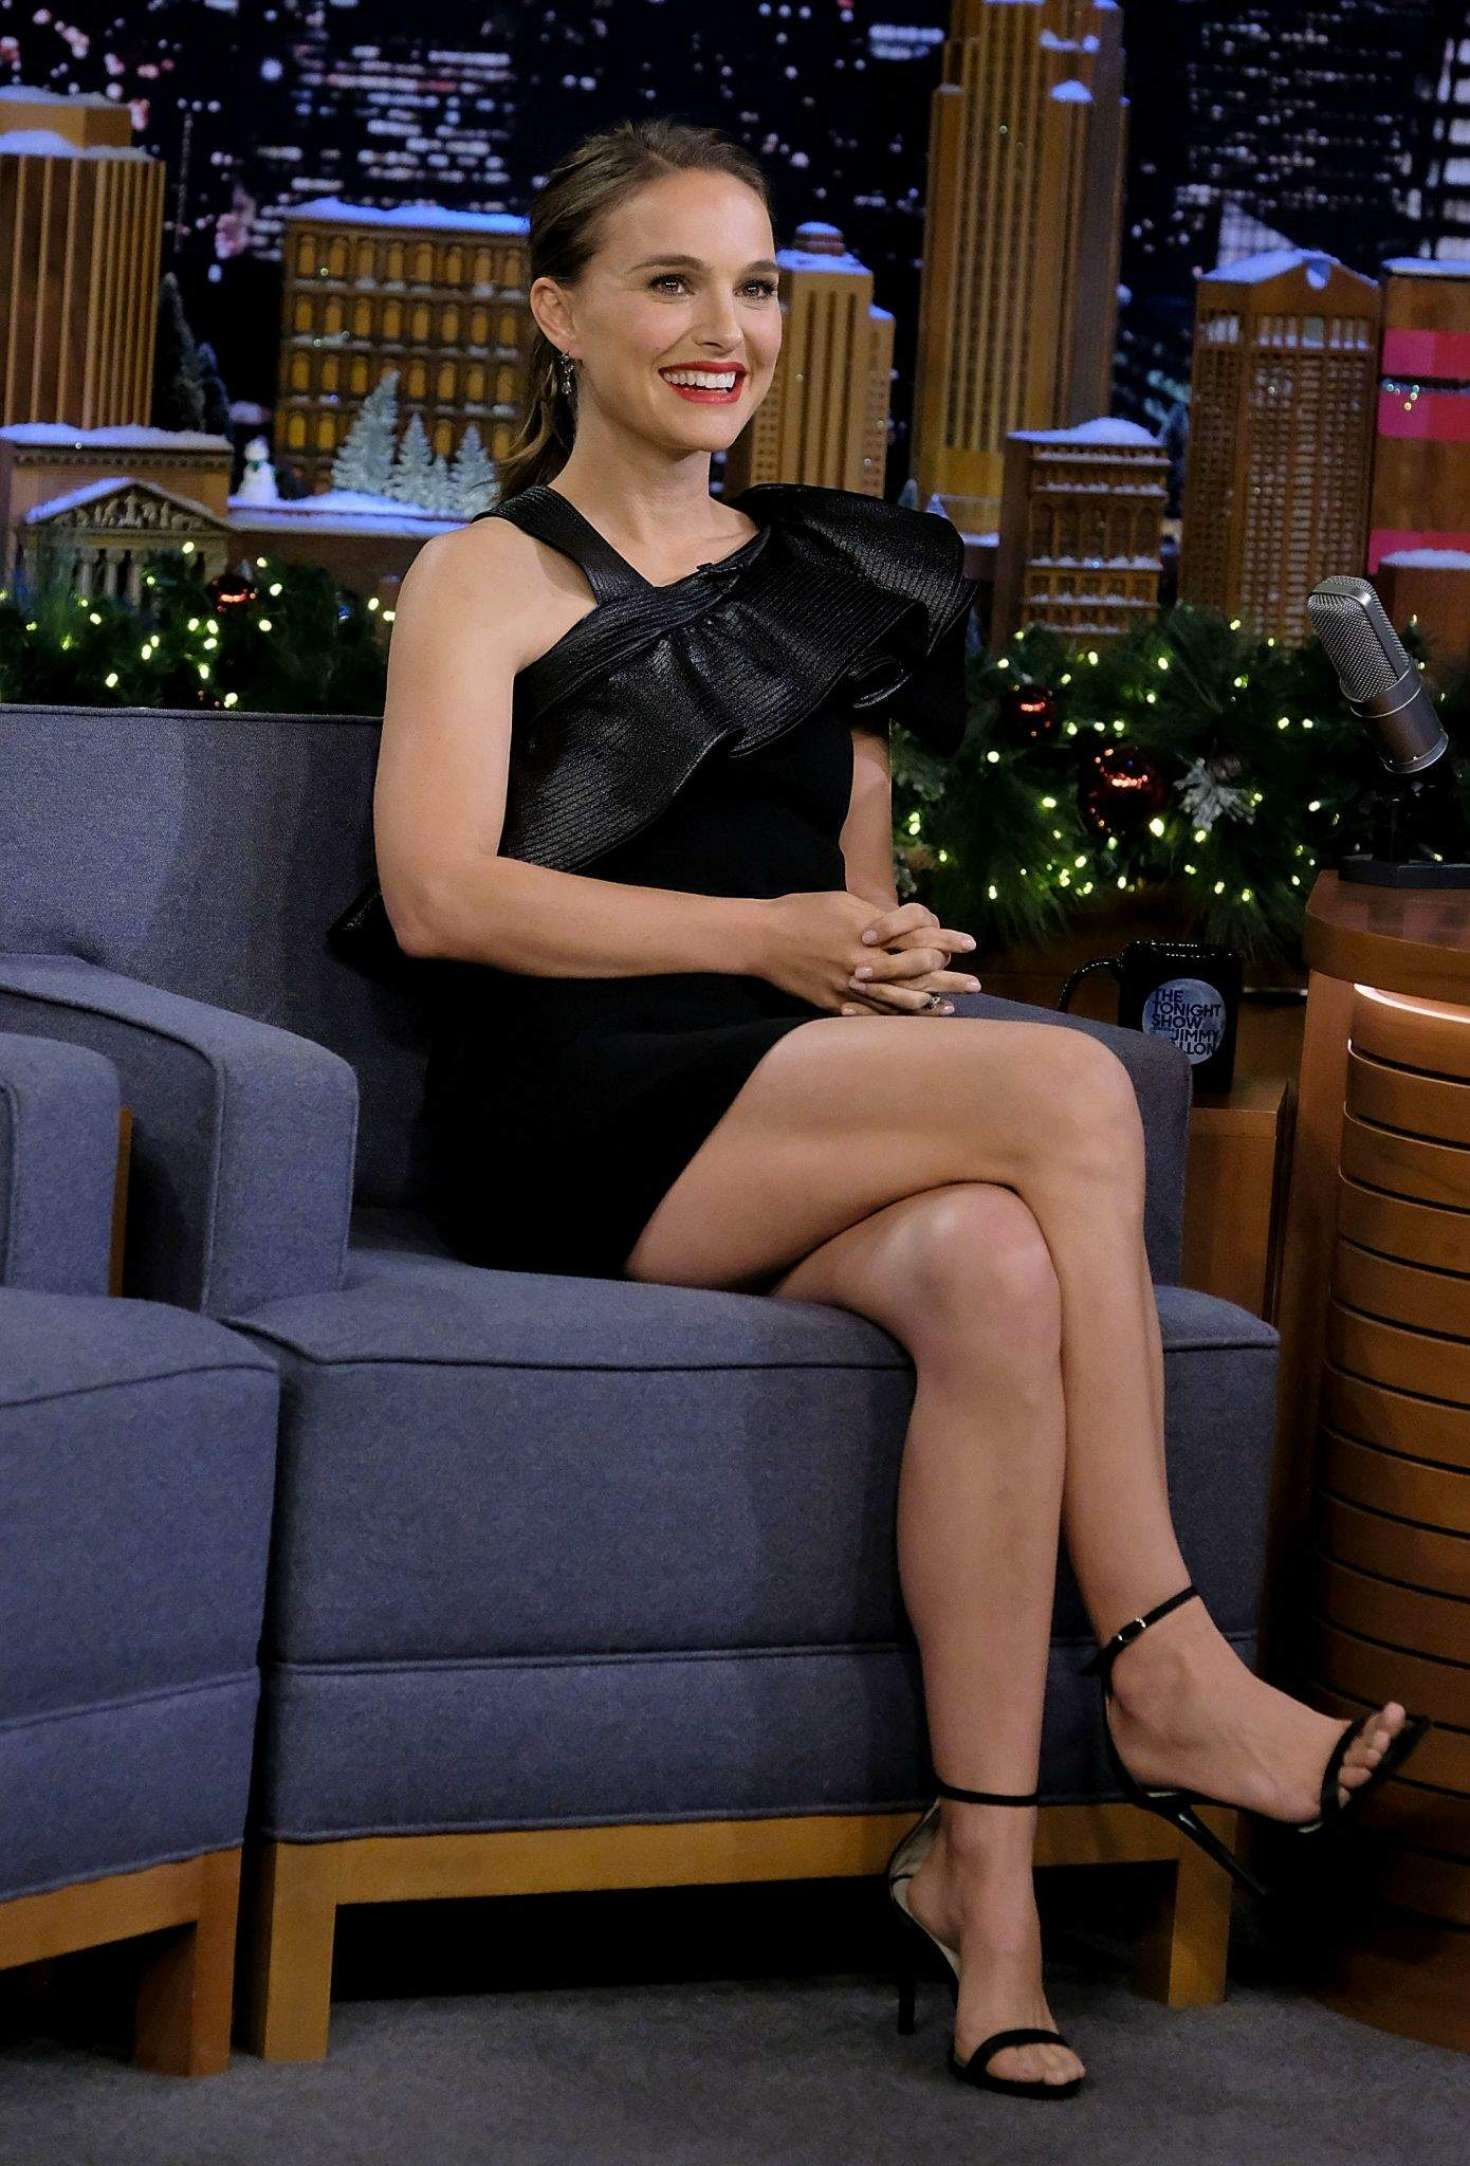 Natalie Portman 2018 : Natalie Portman: The Tonight Show Starring Jimmy Fallon -04